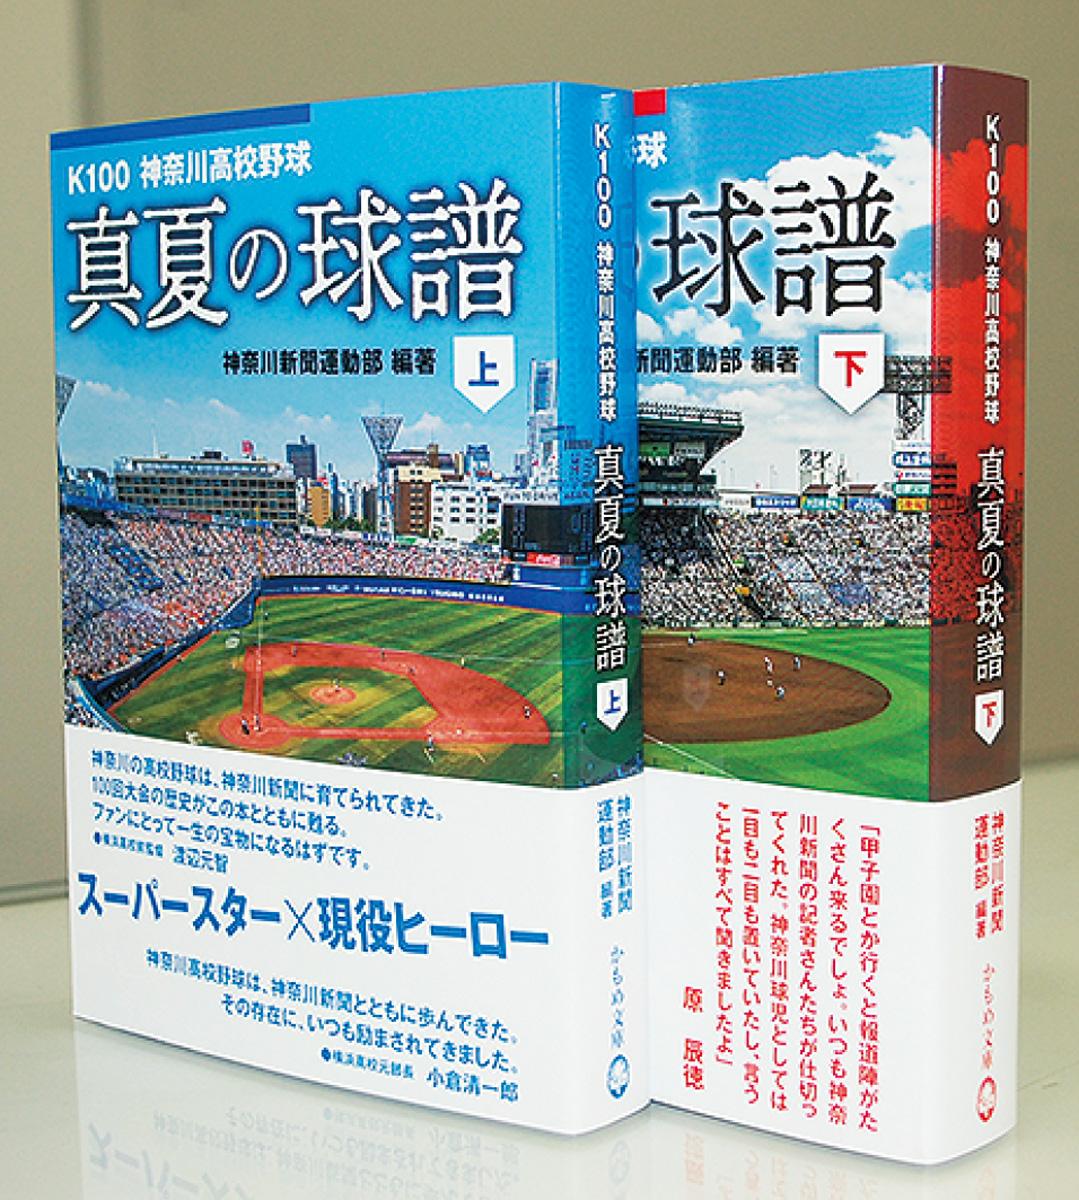 高校野球の魅力凝縮